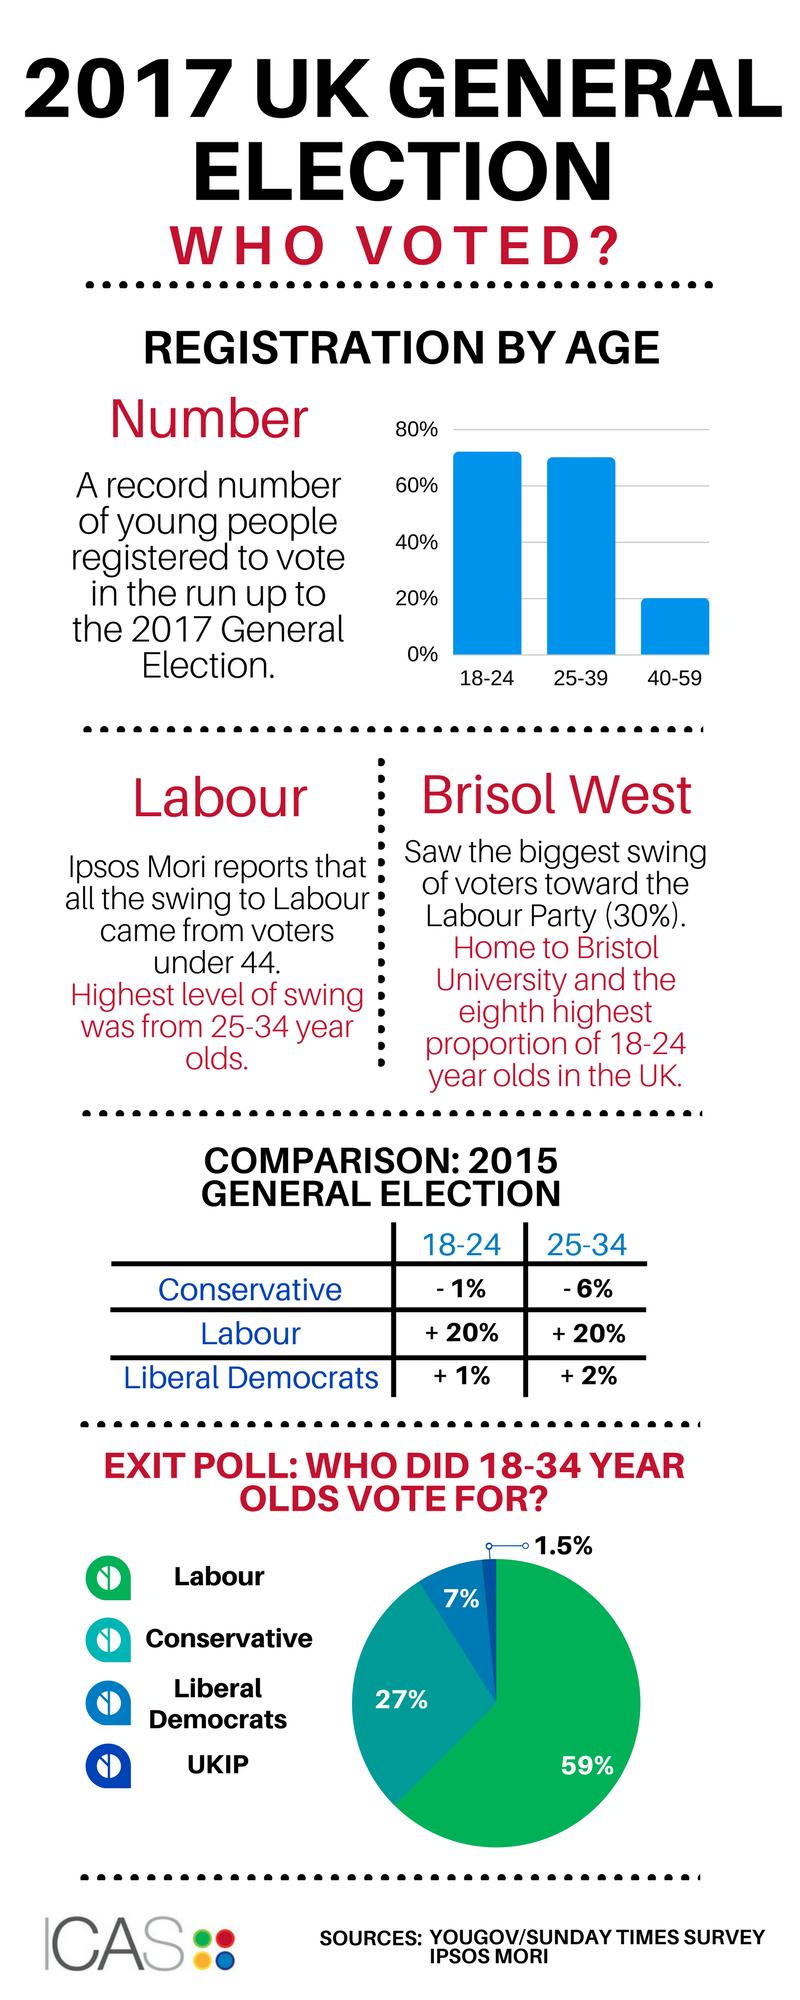 Under 35s: 2017 General Election